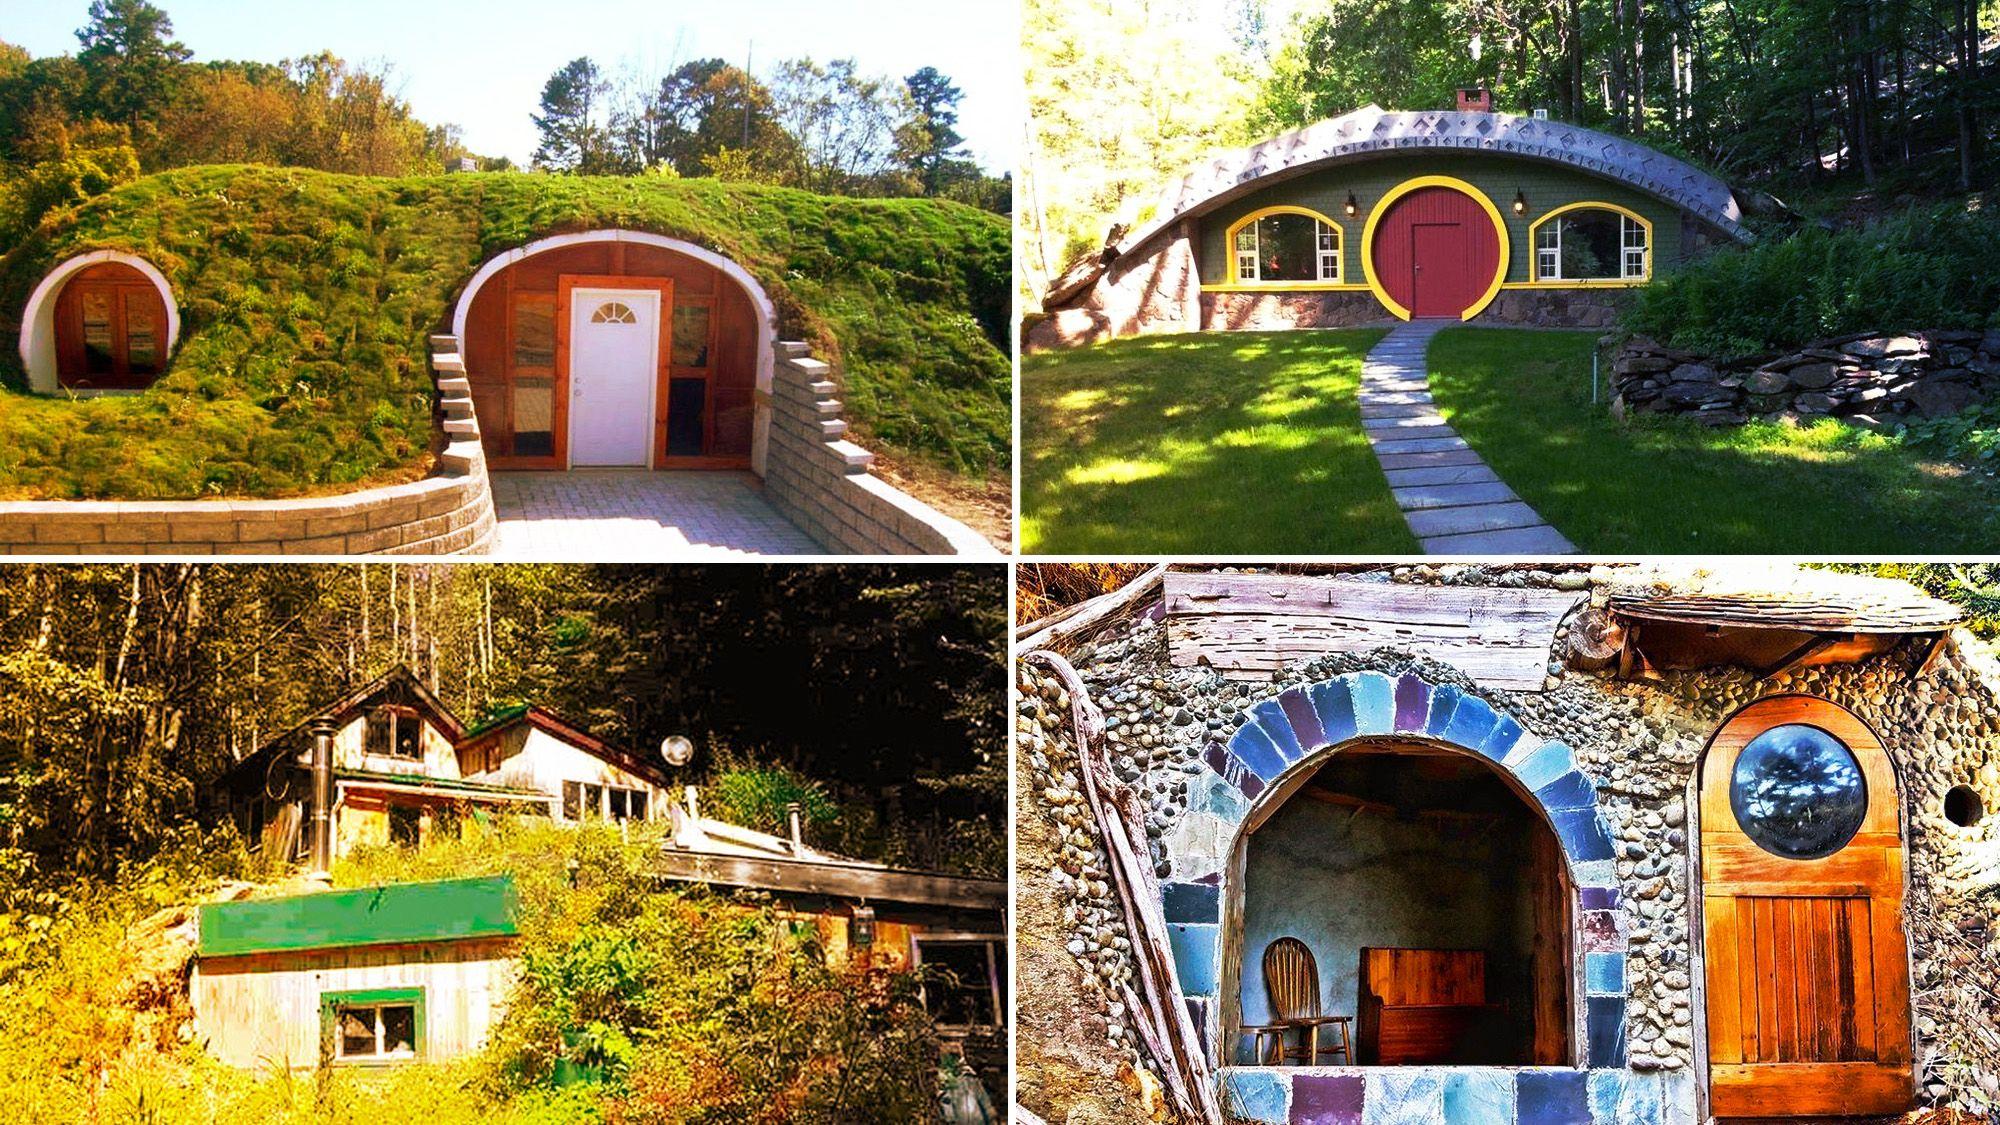 Hobbit Houses For Sale 7 Listings So Precious Bilbo Baggins